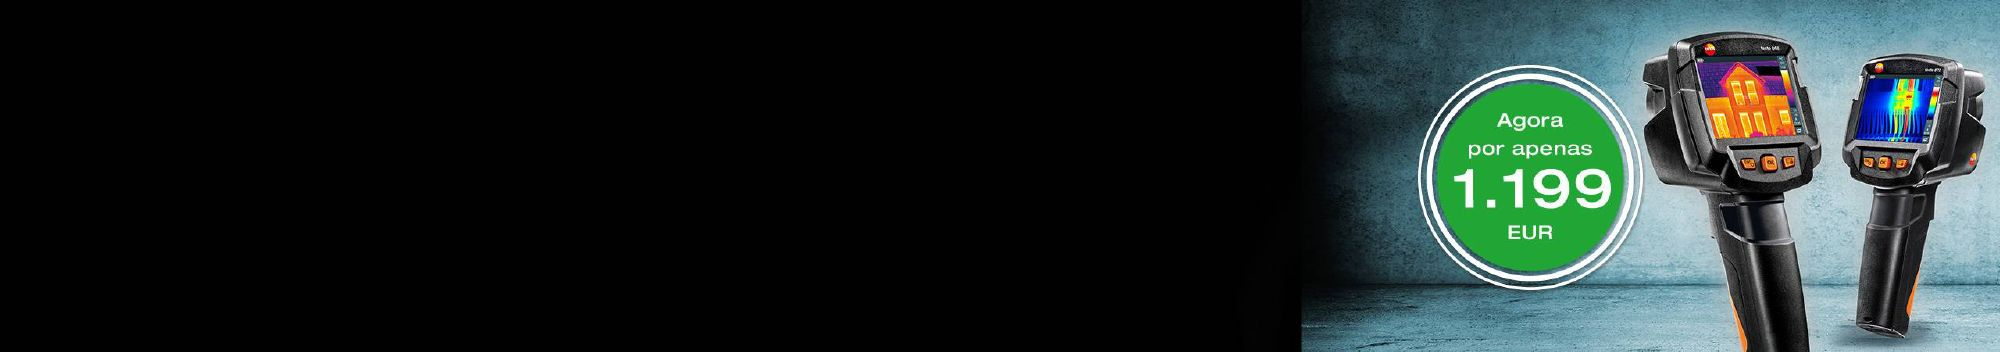 C&acirc;mara termogr&aacute;fica <b>testo 868</b>